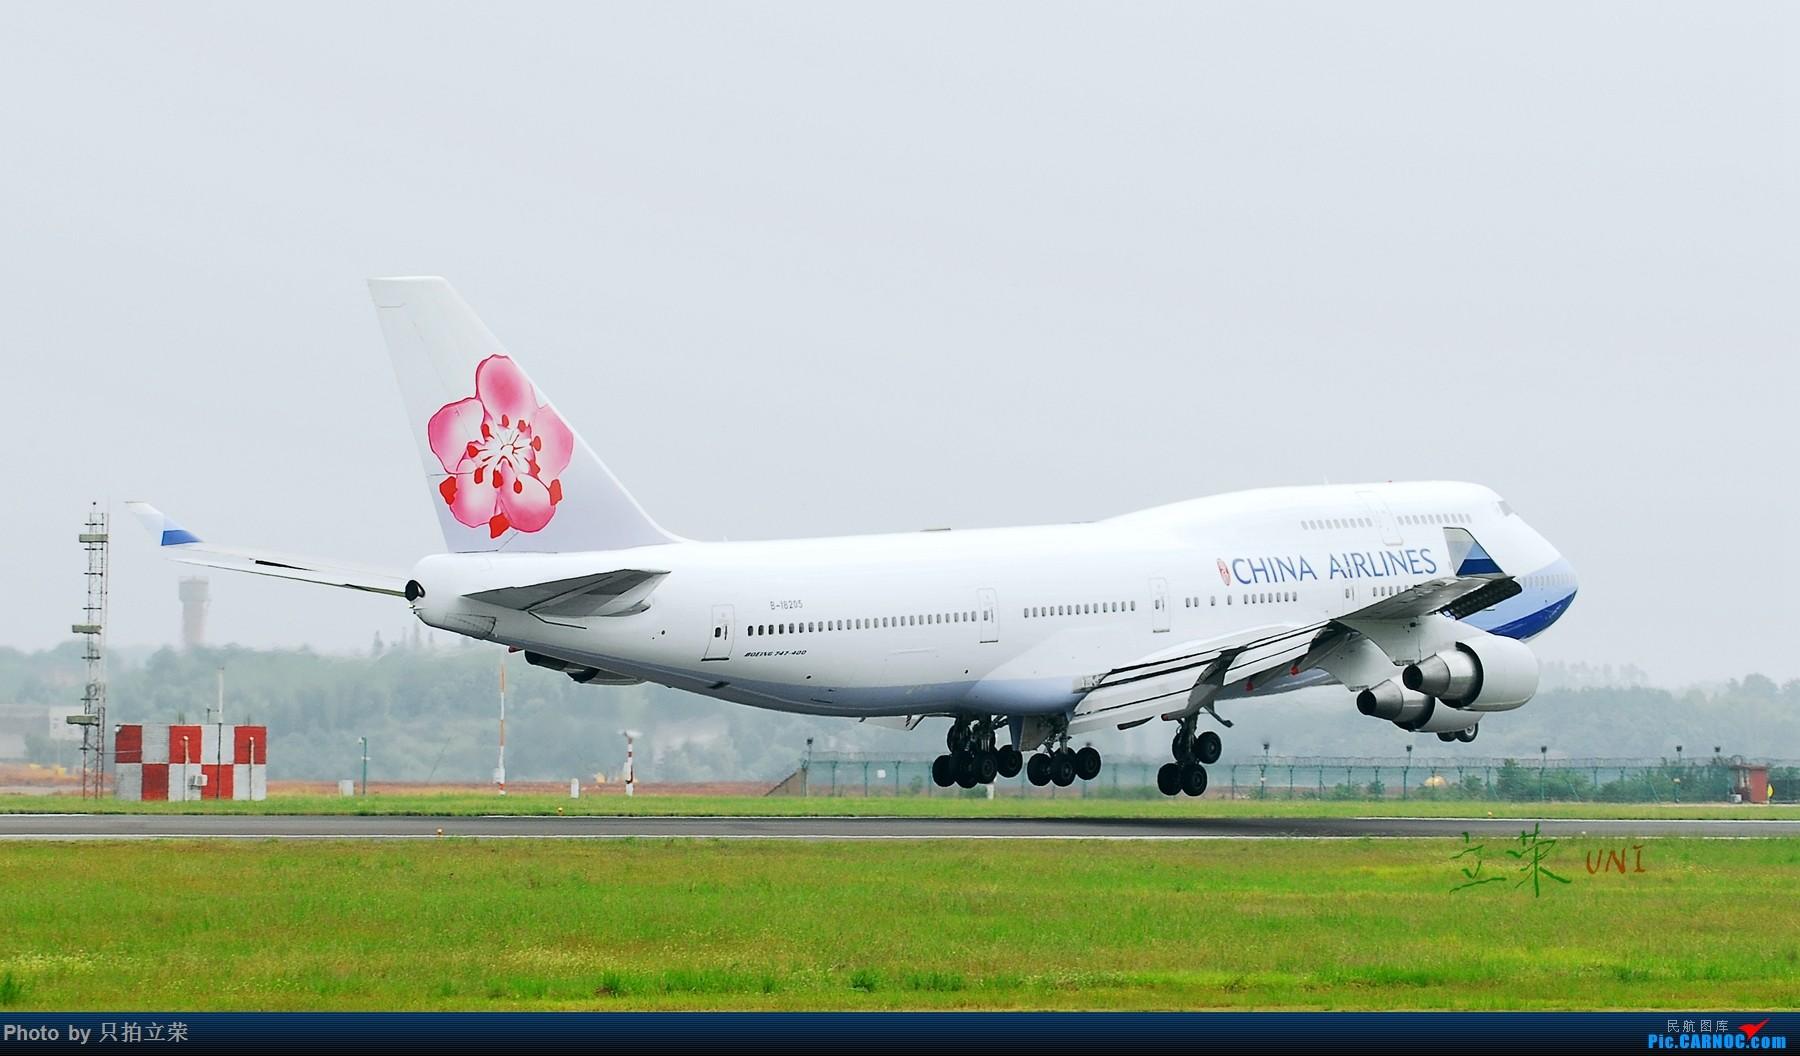 Re:[原创]第一次发图,长沙的大梅花们 BOEING 747-400 B-18205